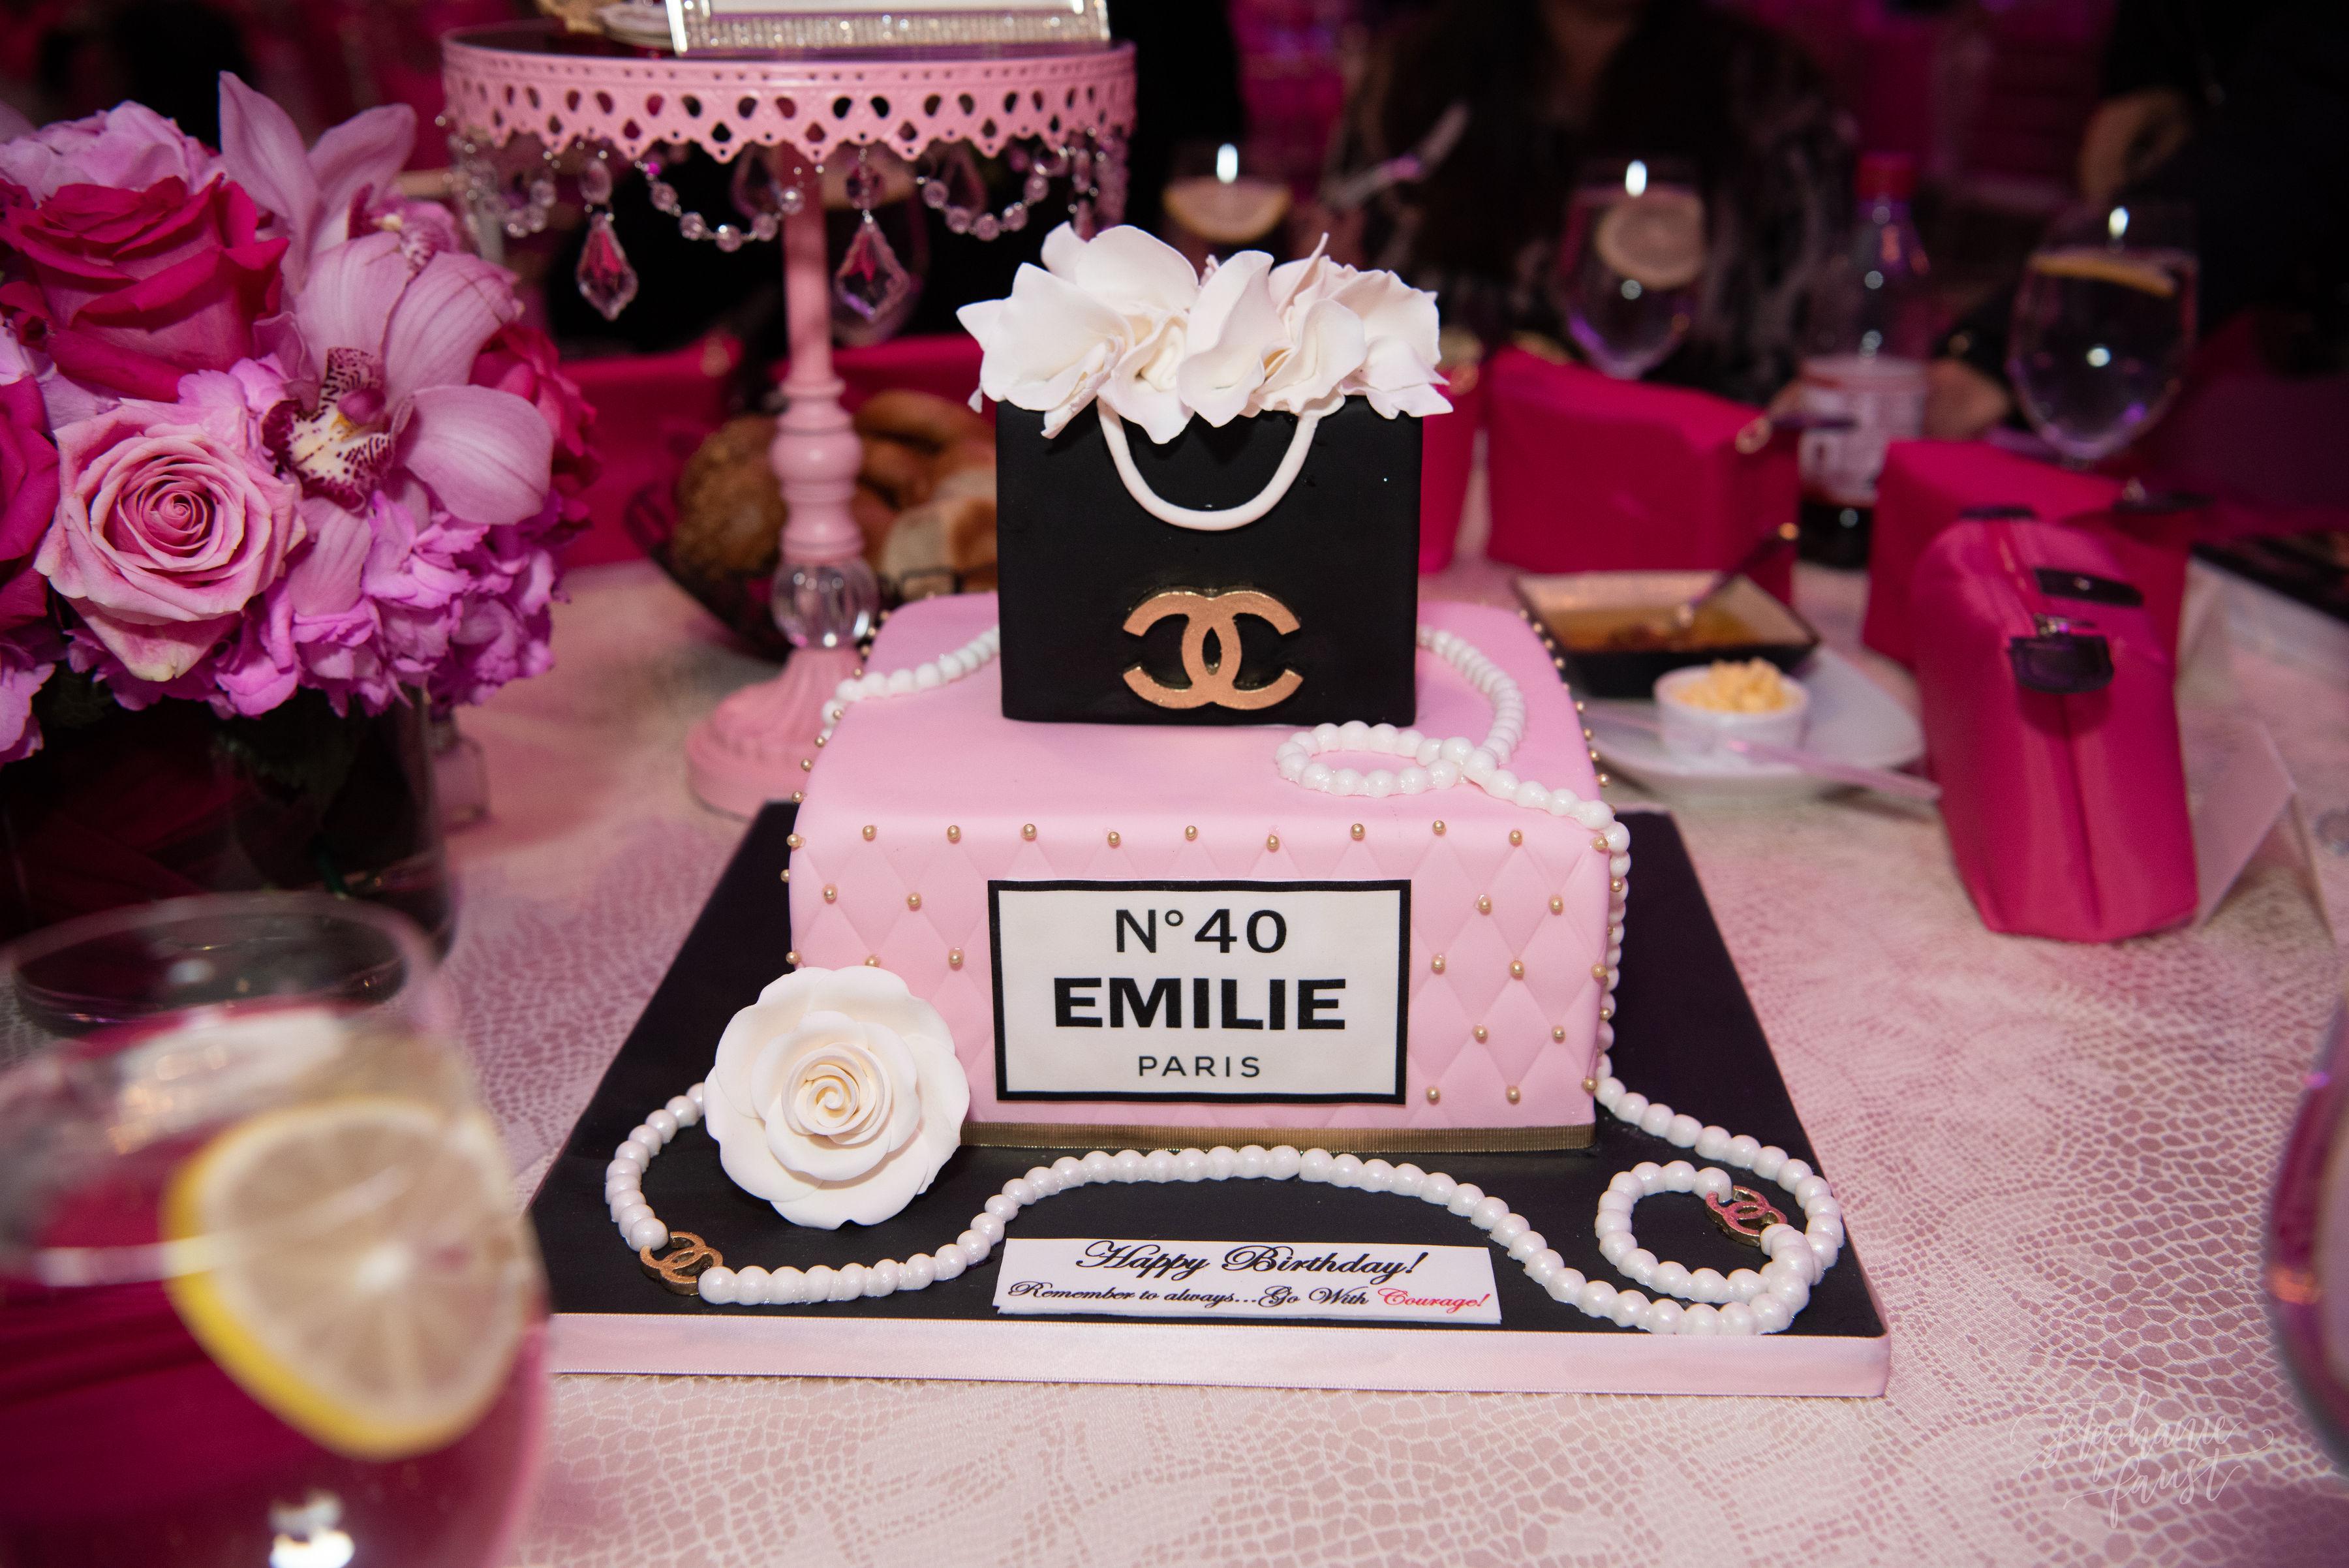 emily's cake #1